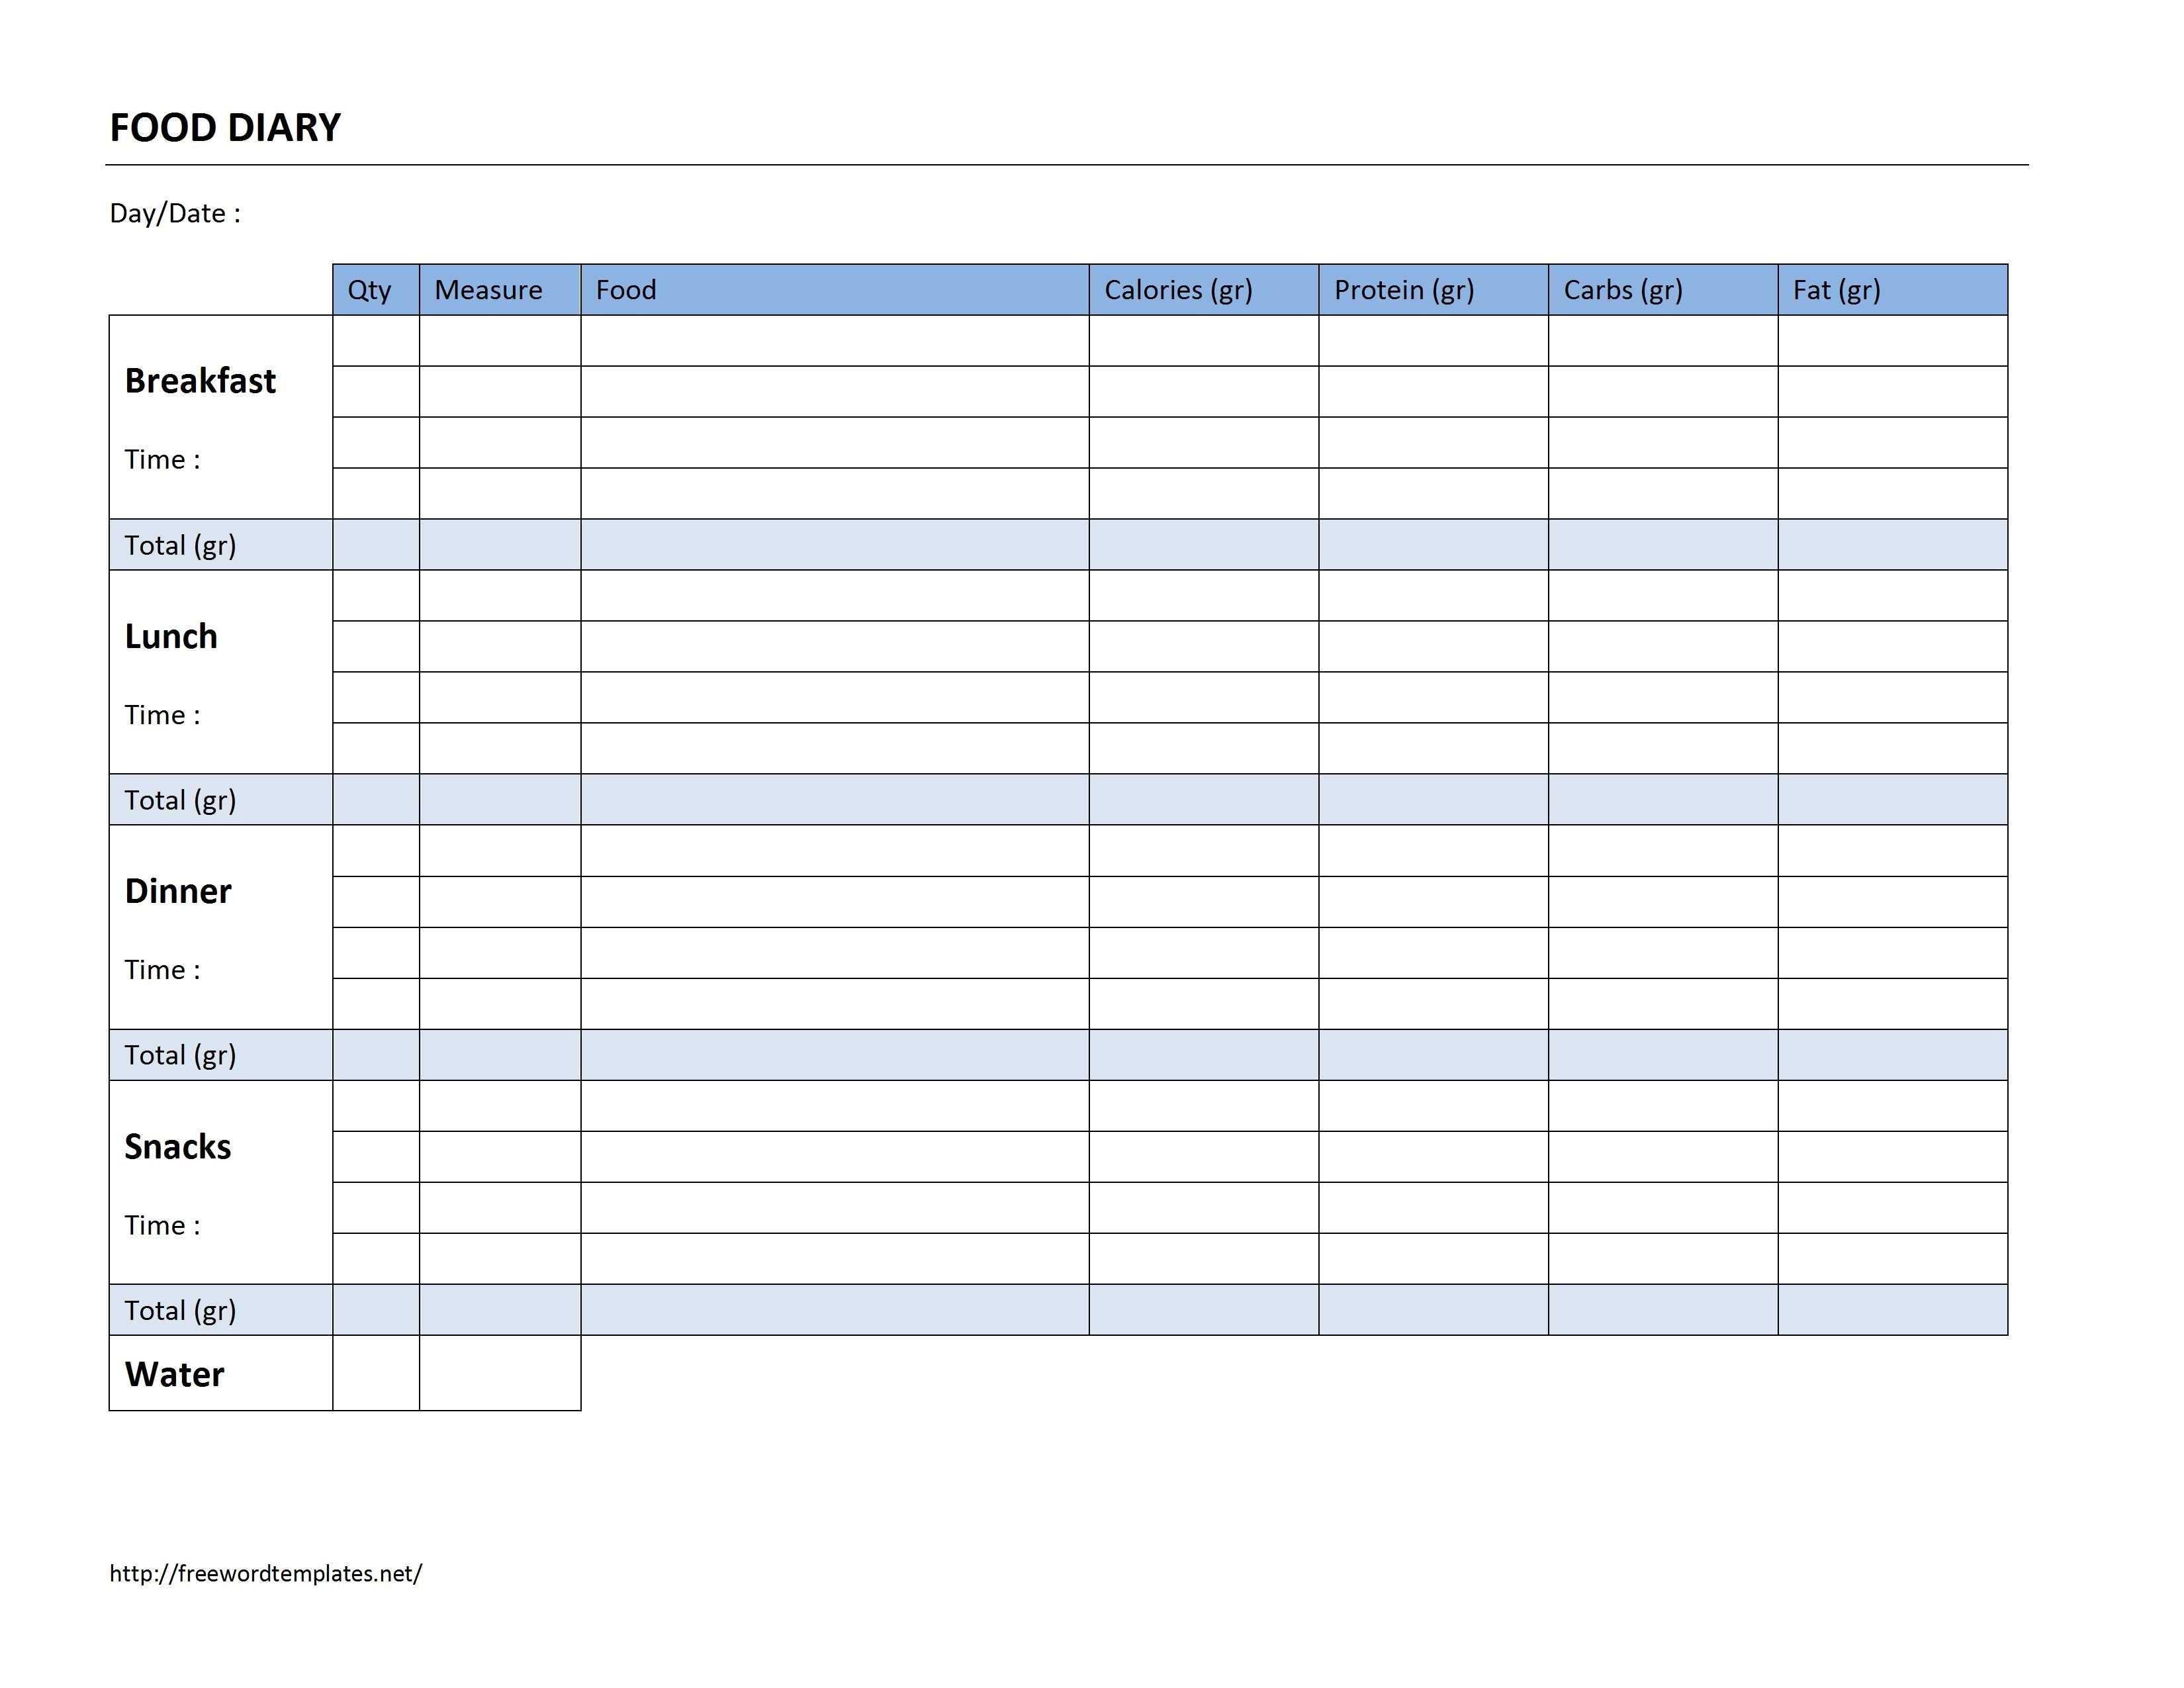 Food Diary Log - Free Printable Calorie Counter Journal